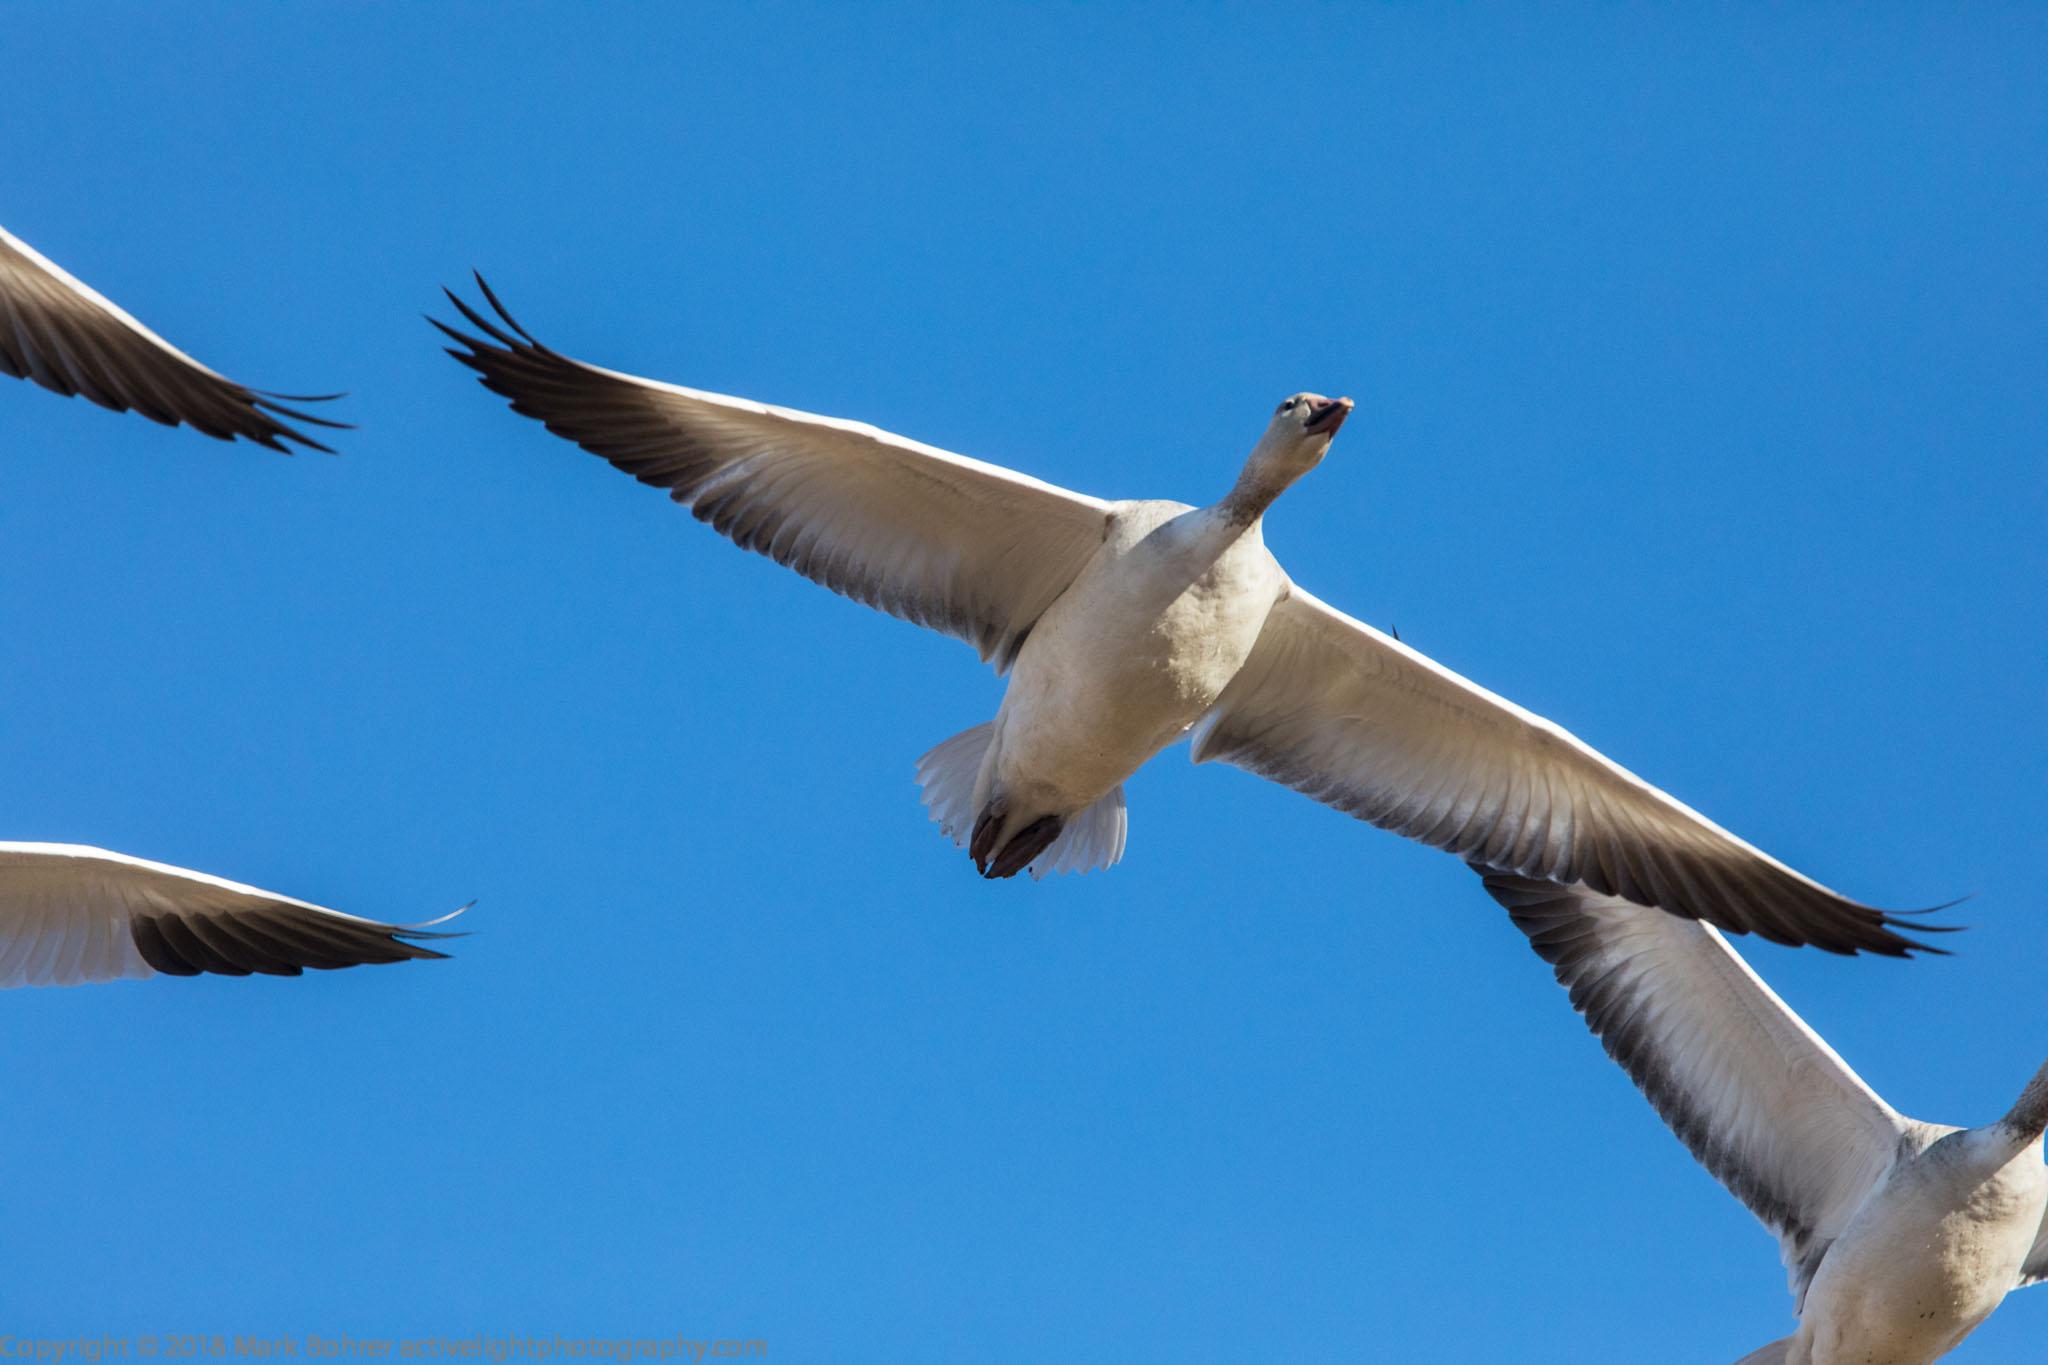 Goose overhead flight